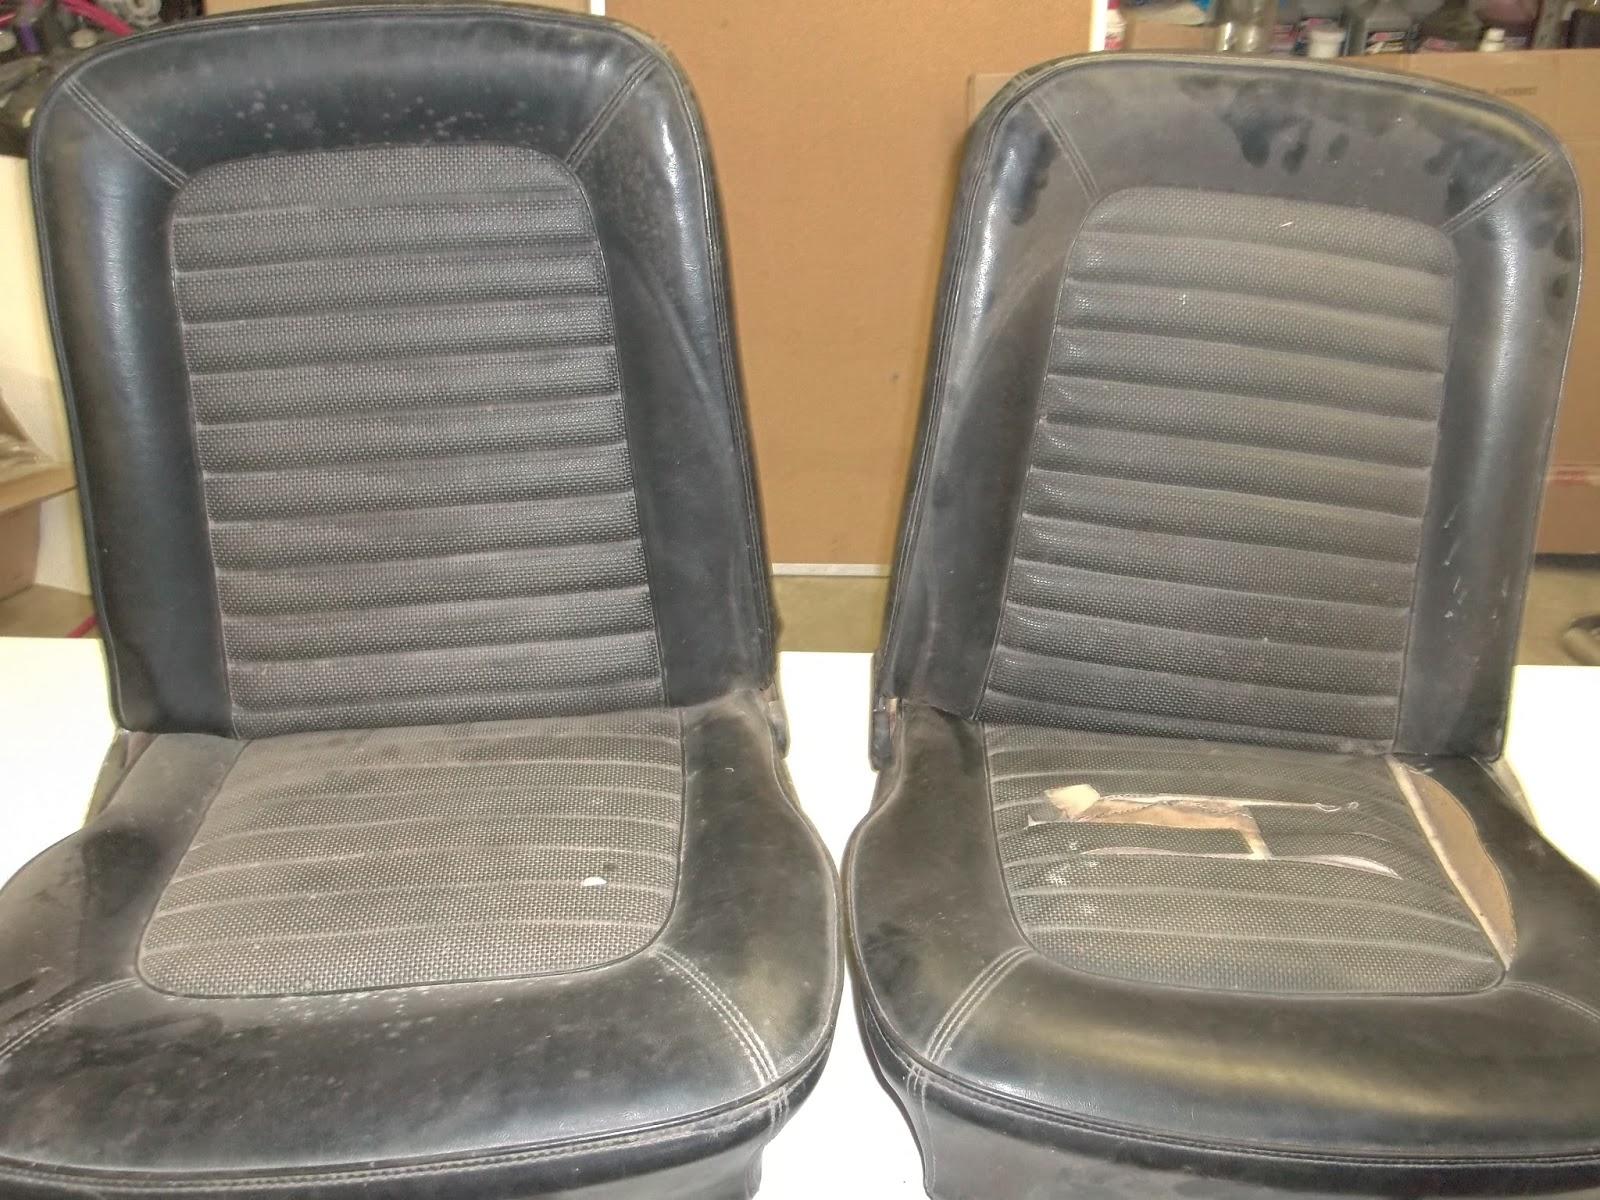 65 Mustang Restoration Post 58 9 8 15 Reupholstering The Seats